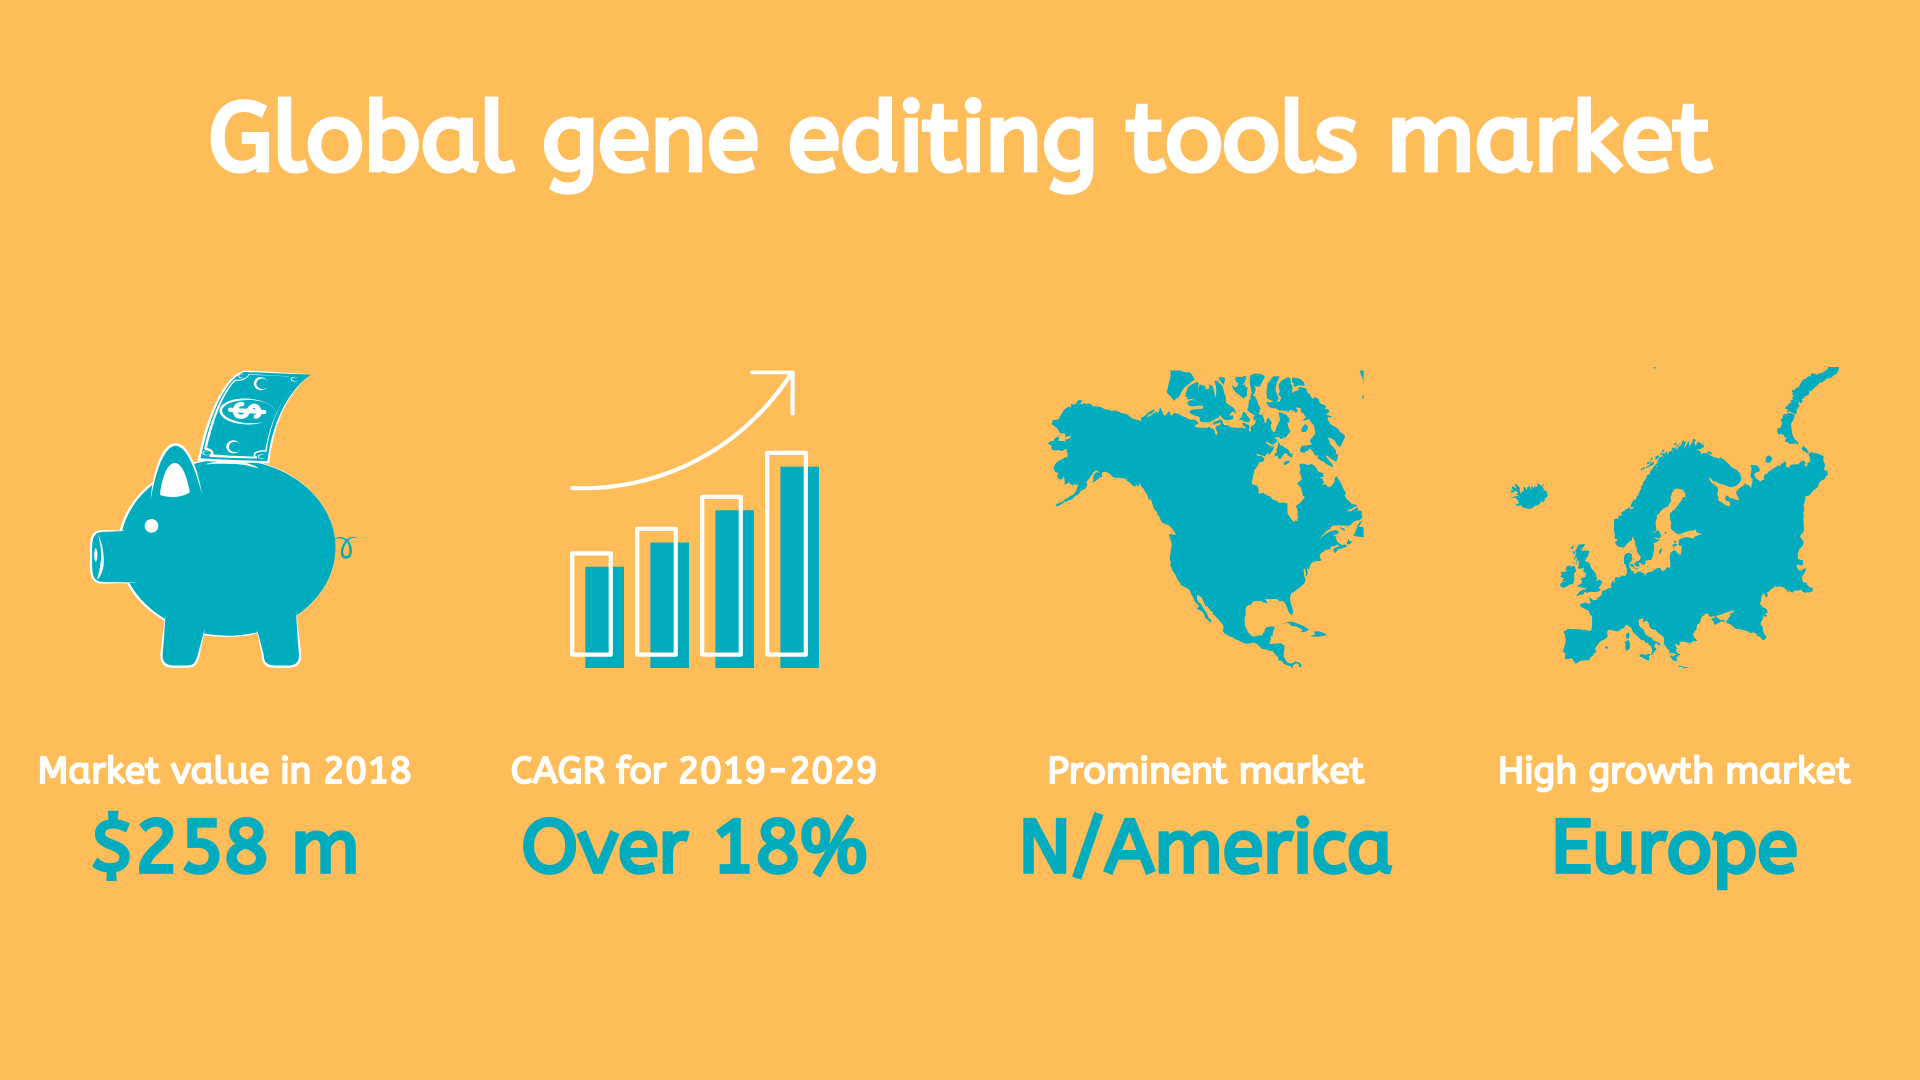 The global gene editing tools market.